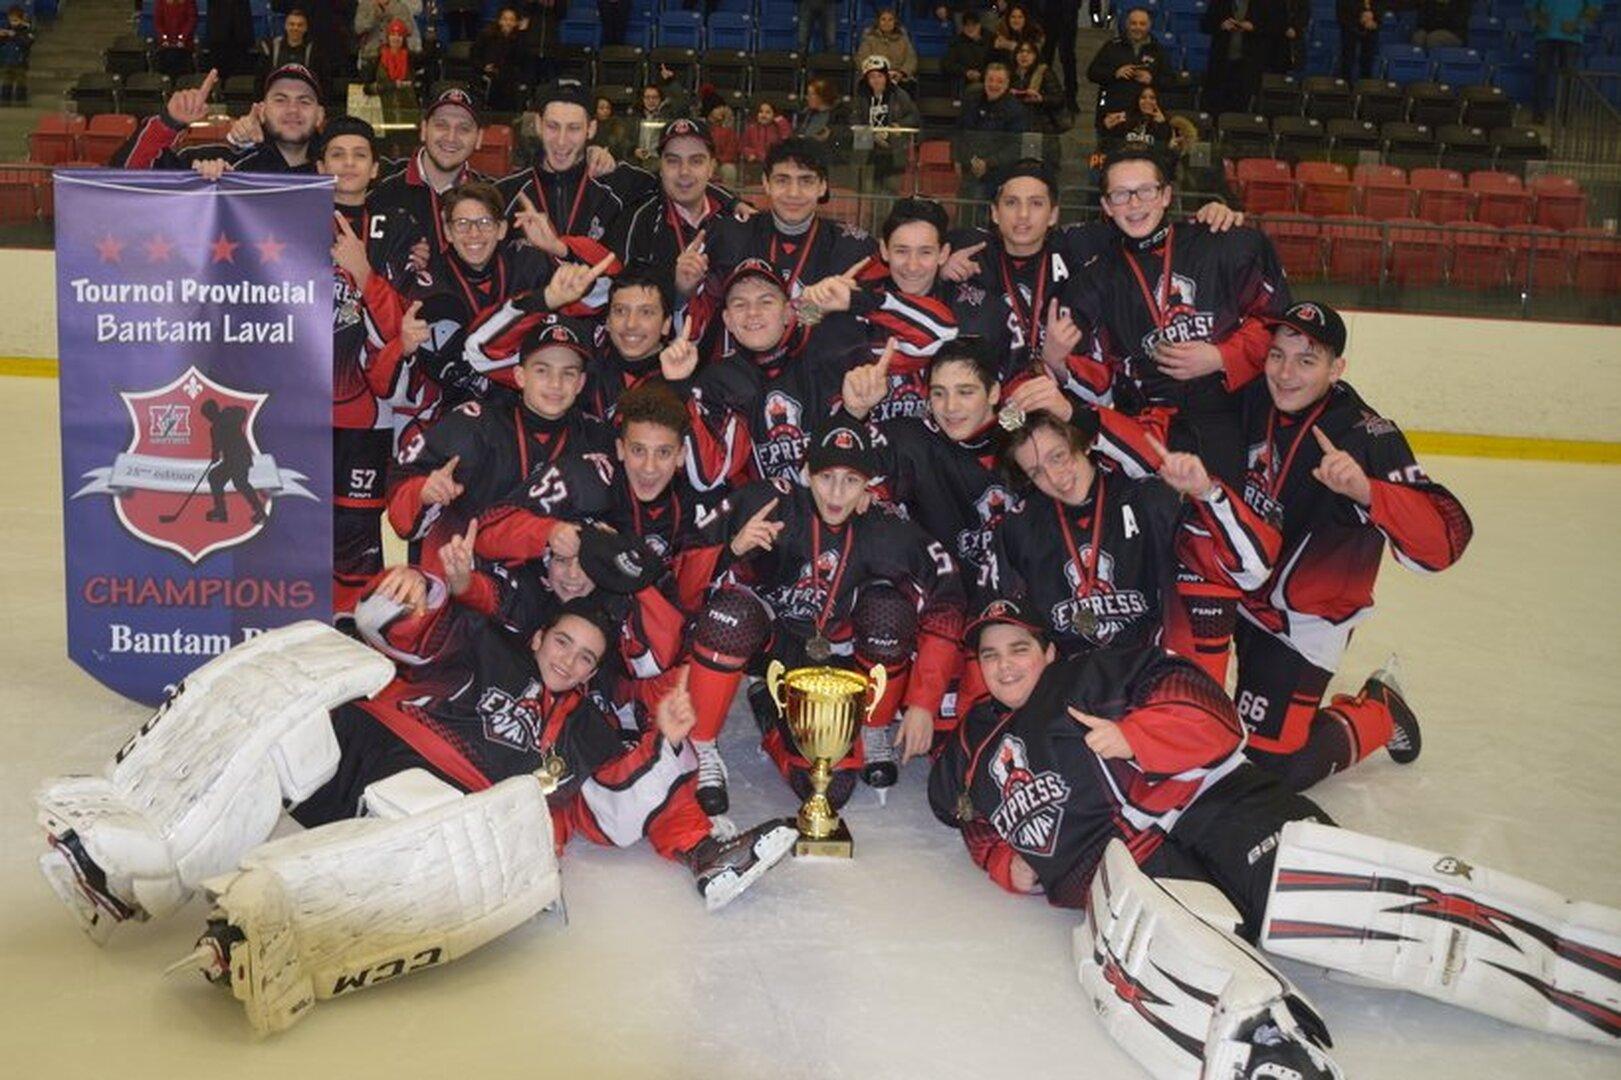 Champions Bantam BB_2018 Les Dynamos Express Laval